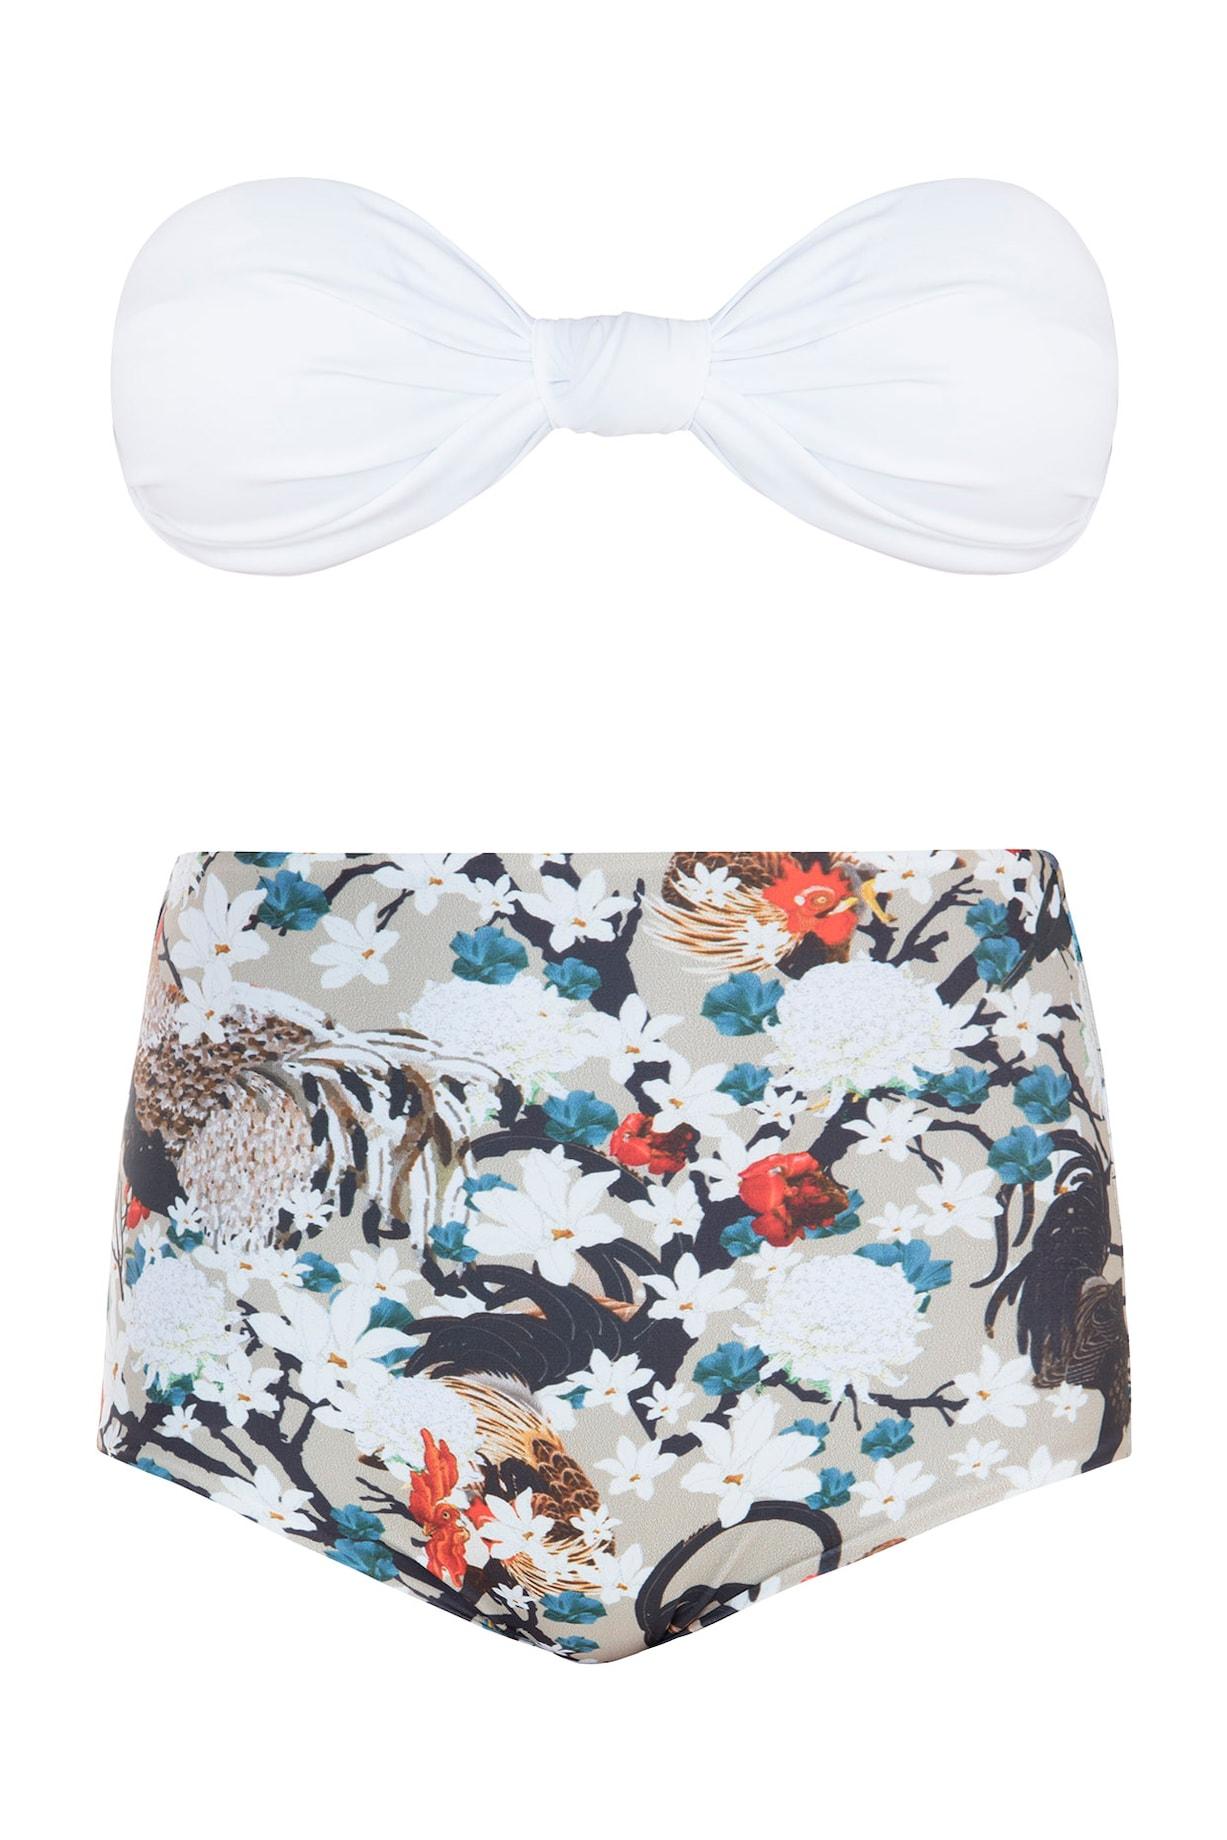 519e541131 Multicolour praslin knotted bikini set Design by Shivan   Narresh at ...